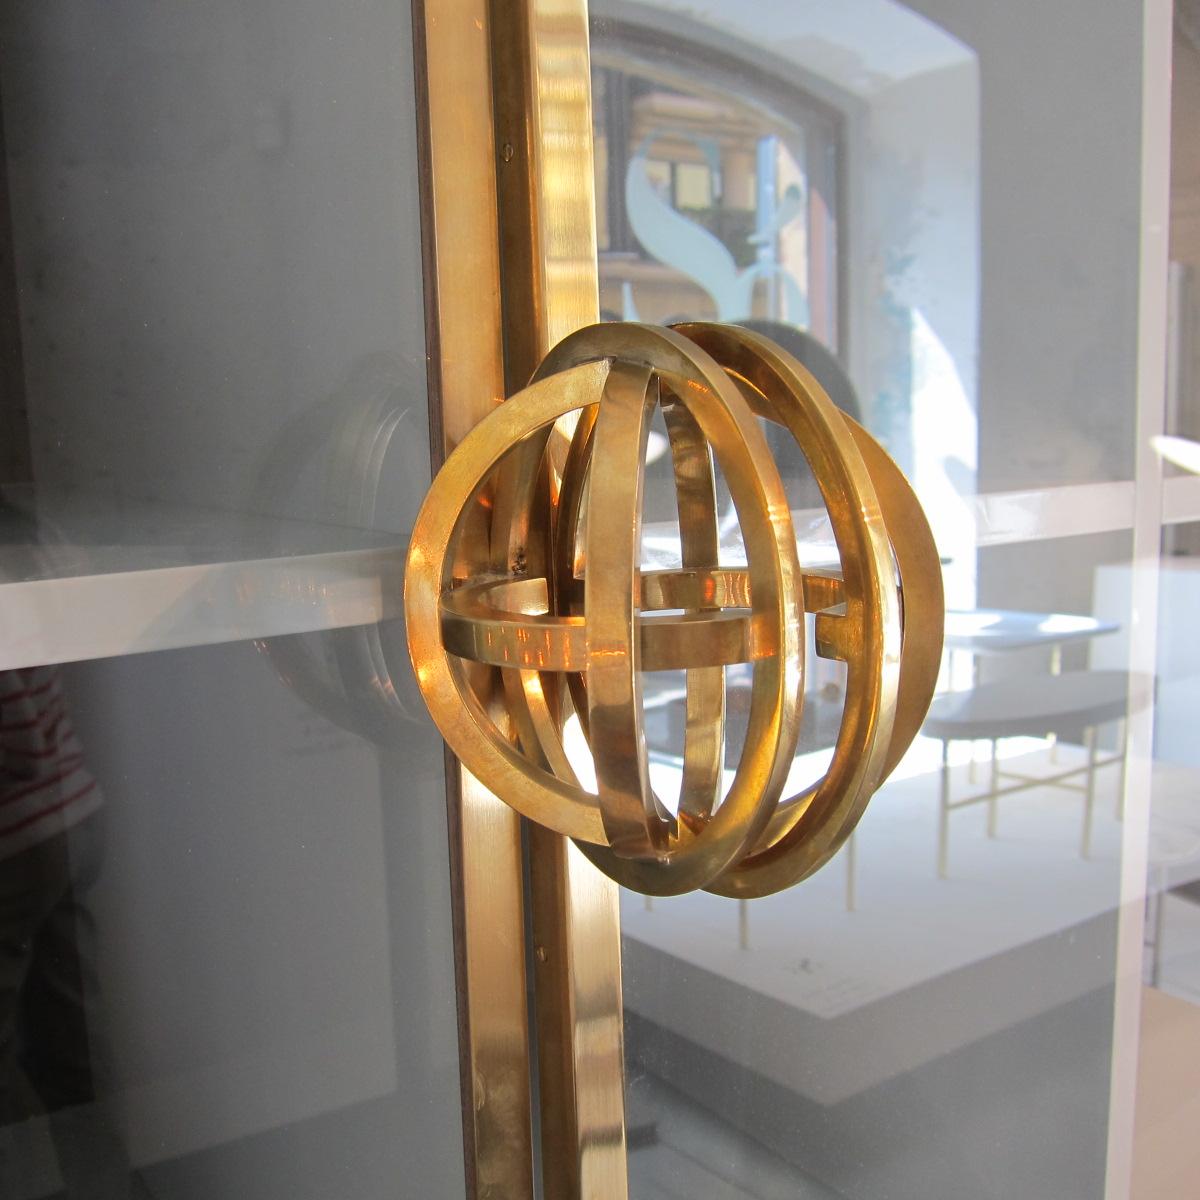 web doorknob.JPG